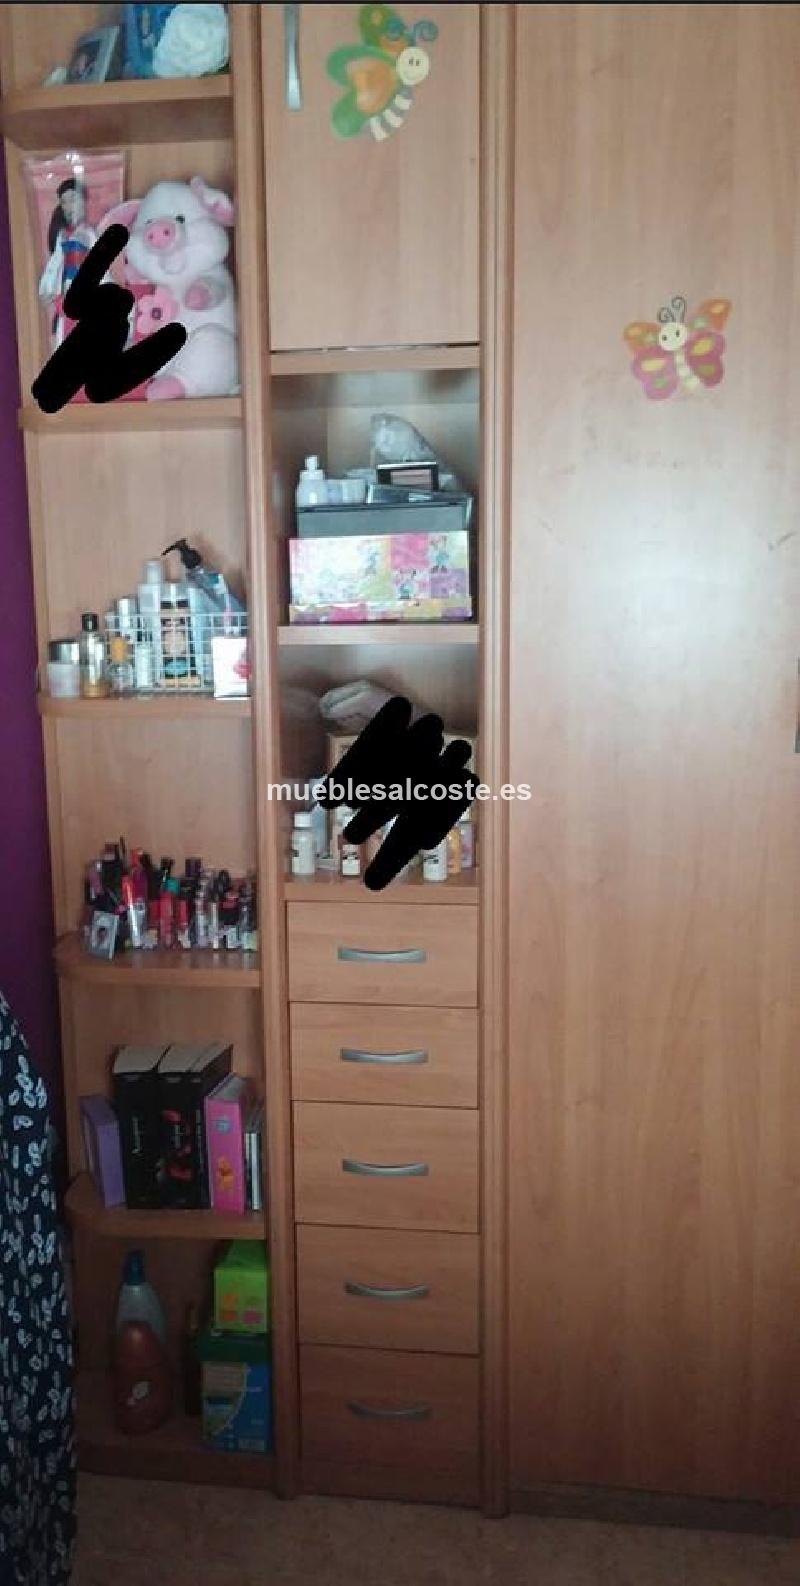 Dormitorio juvenil de chica 12748 segunda mano - Dormitorio juvenil chica ...